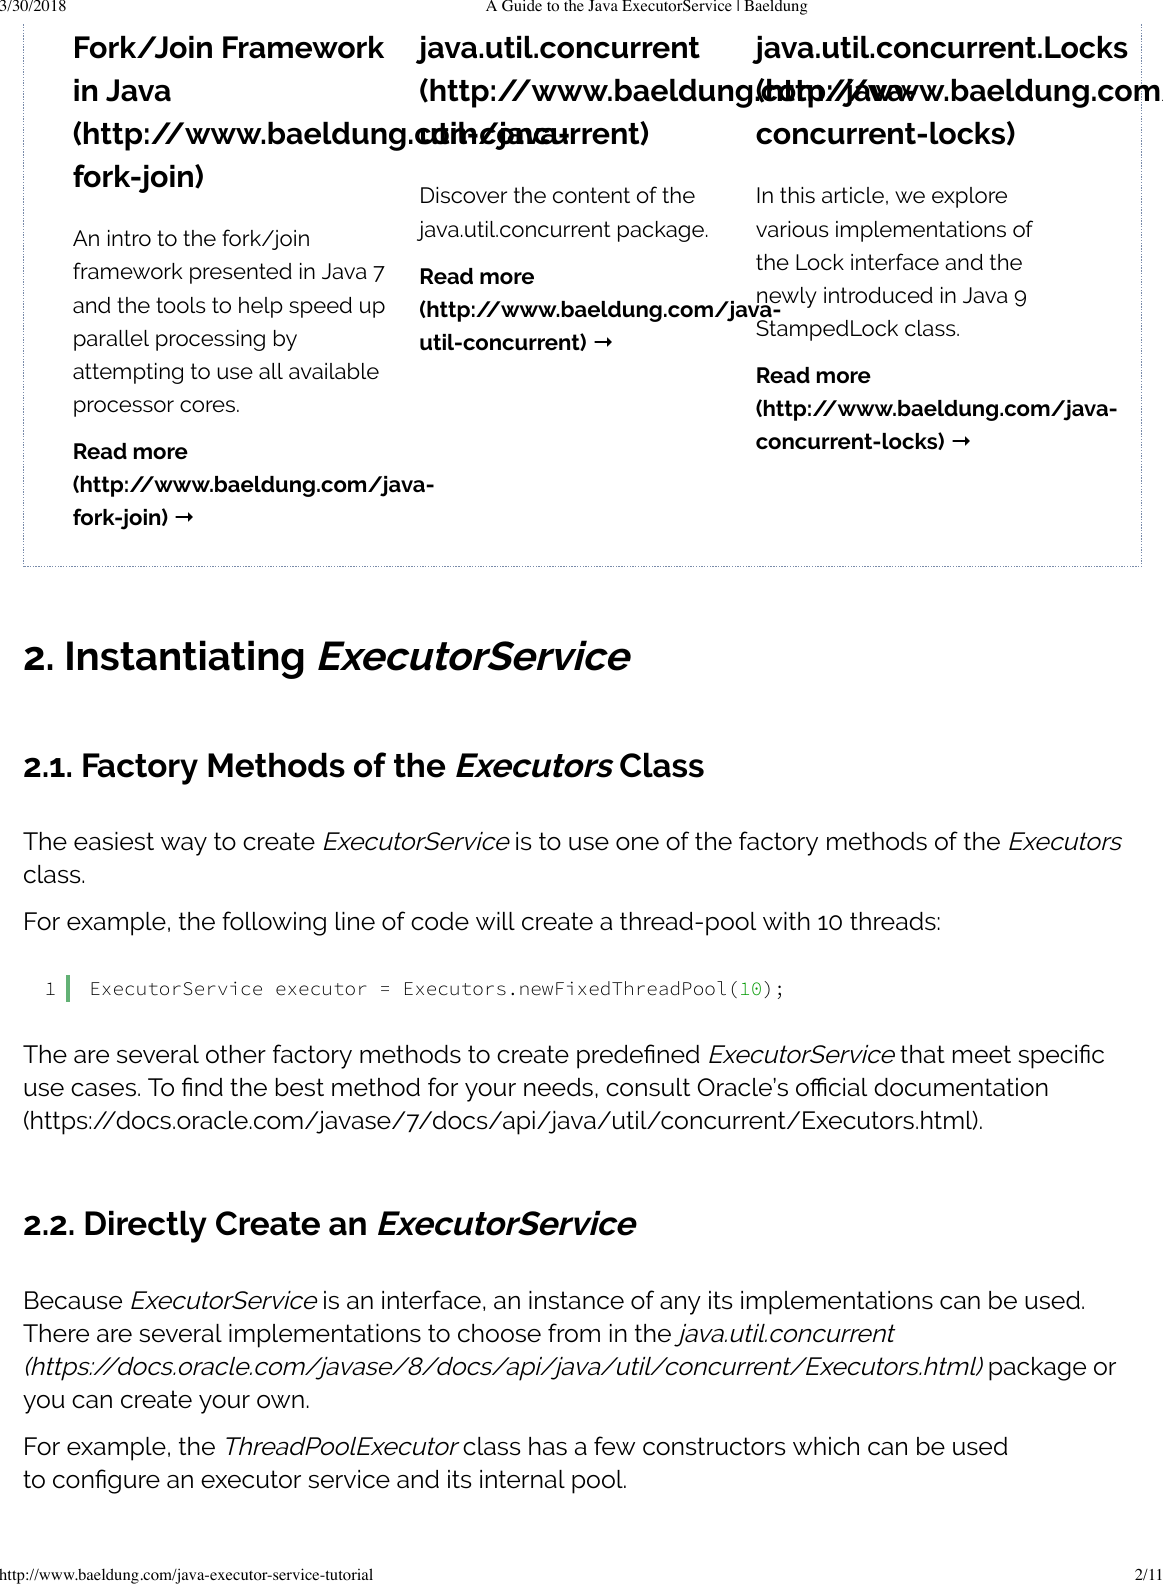 A Guide To The Java Executor Service Baeldung